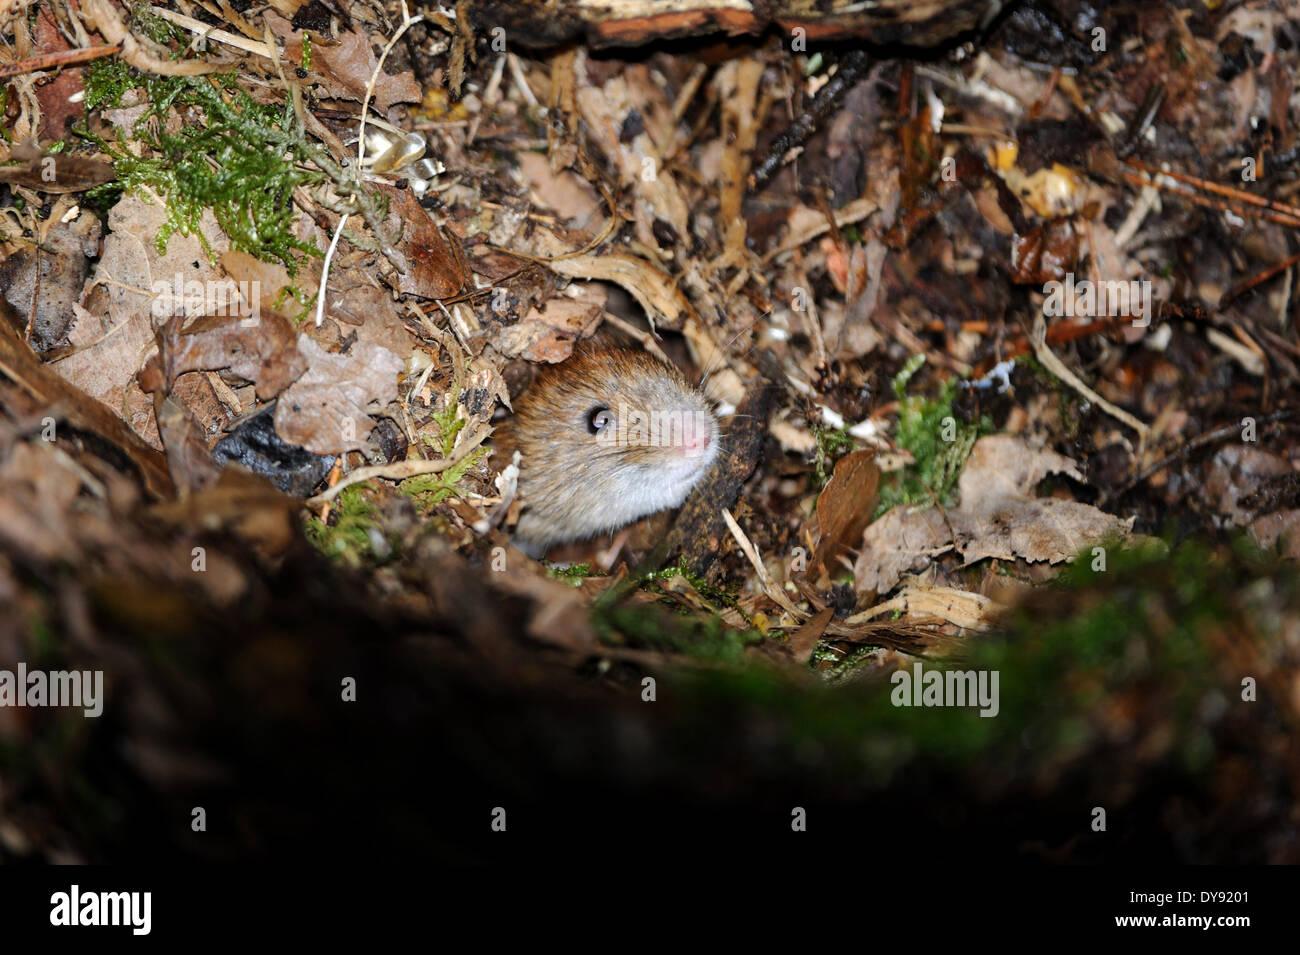 bank vole wintry forest ground Myodes glareolus mouse mammals vertebrates mice field mice voles muroids cricetids bank voles, - Stock Image